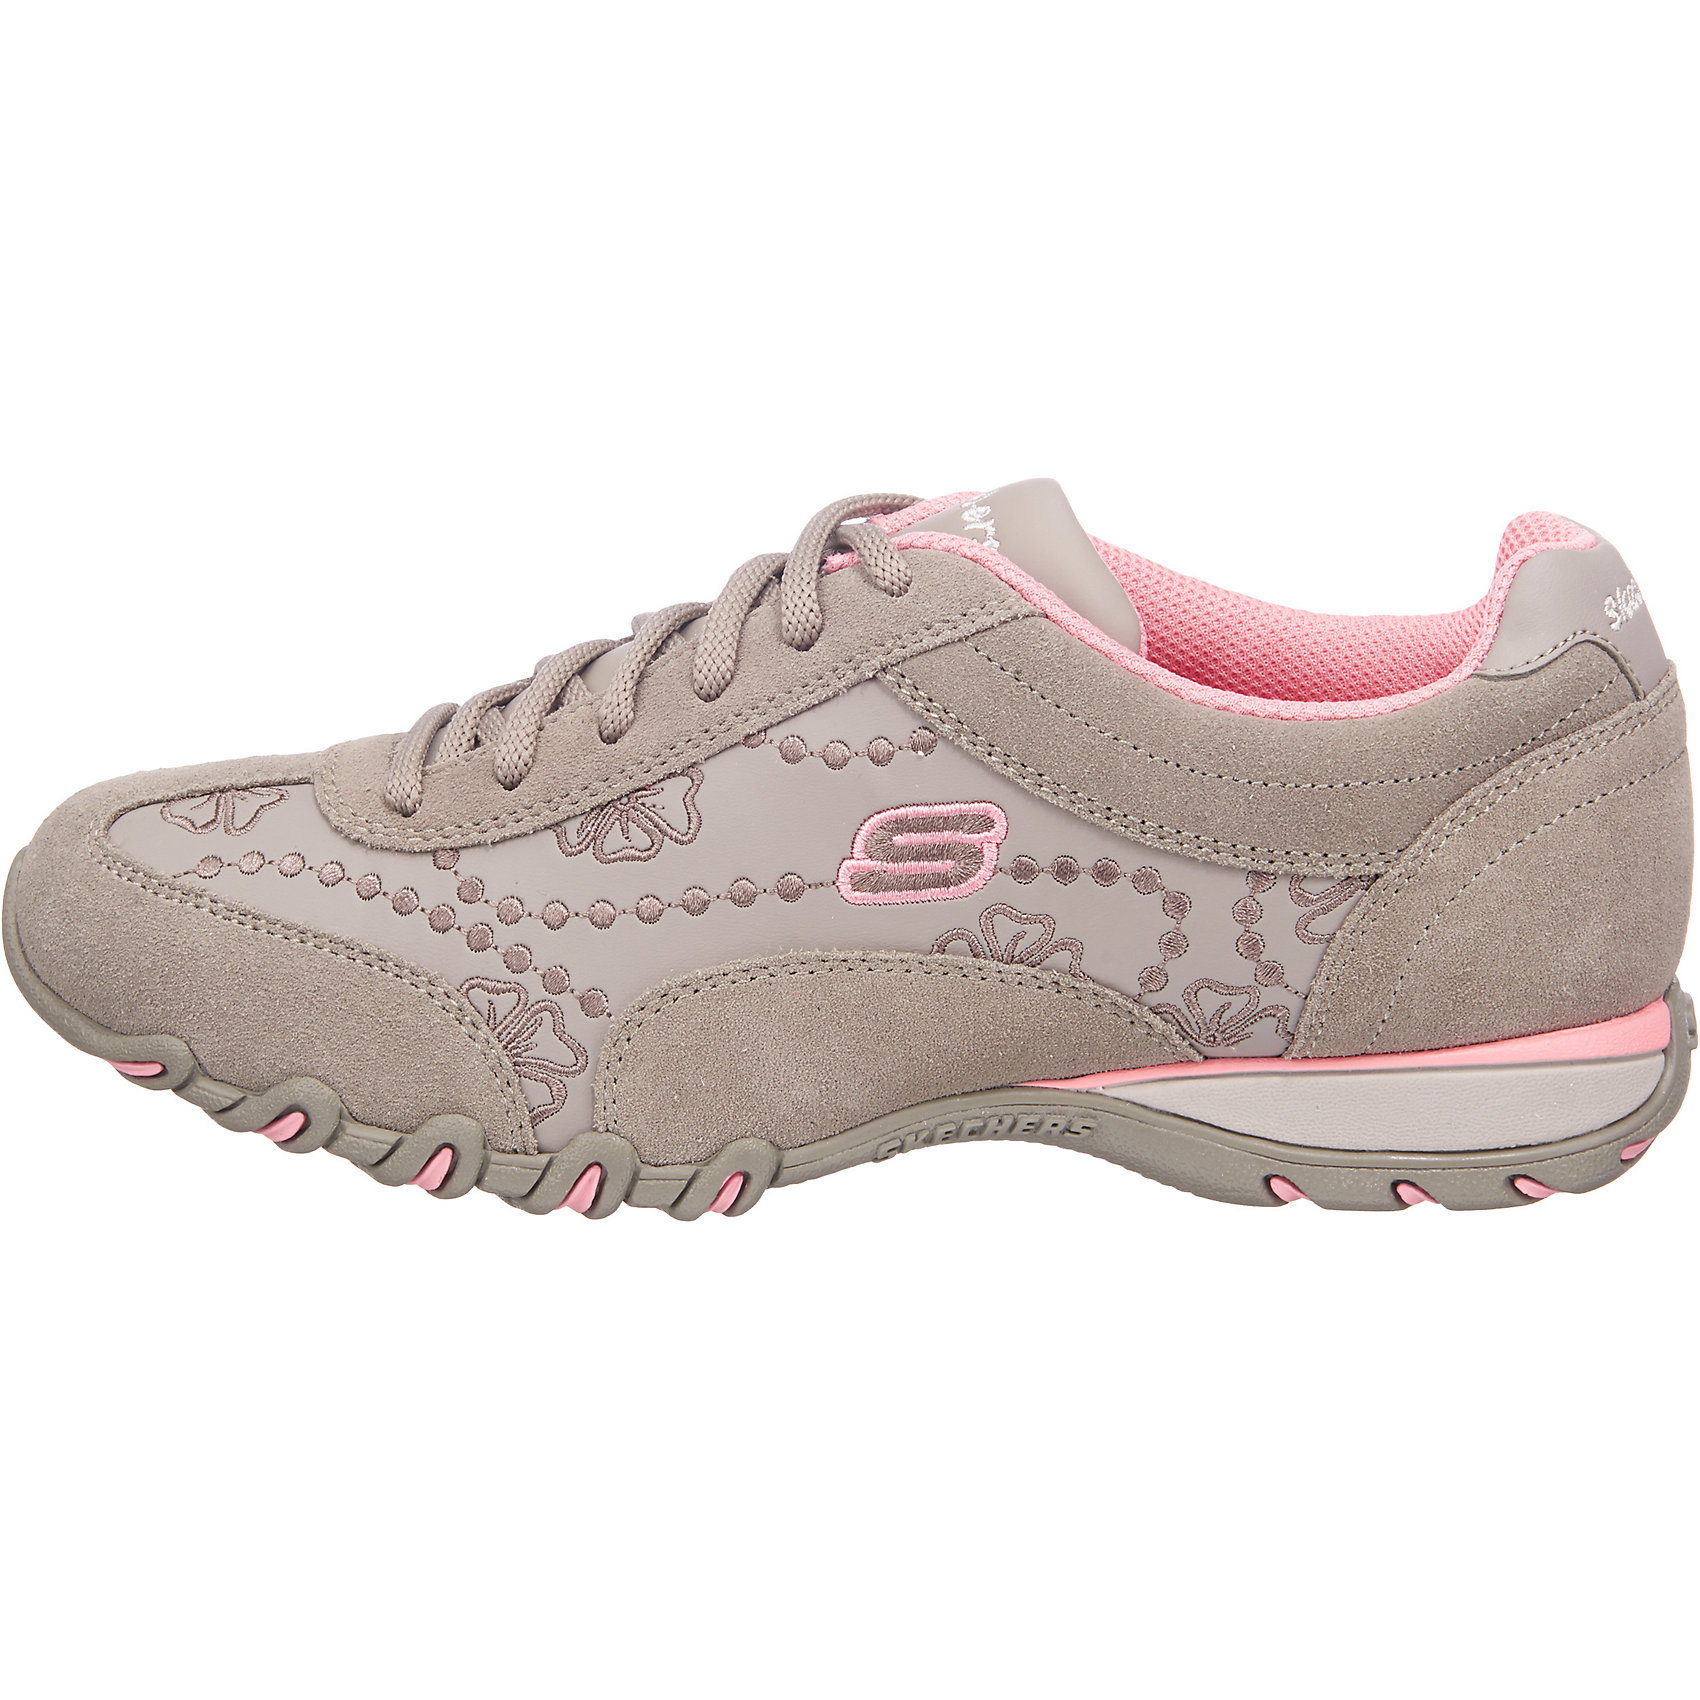 Neu SKECHERS Speedsters Speedsters Speedsters Lady Operator Sneakers Niedrig 5752748 für Damen 8df3fe